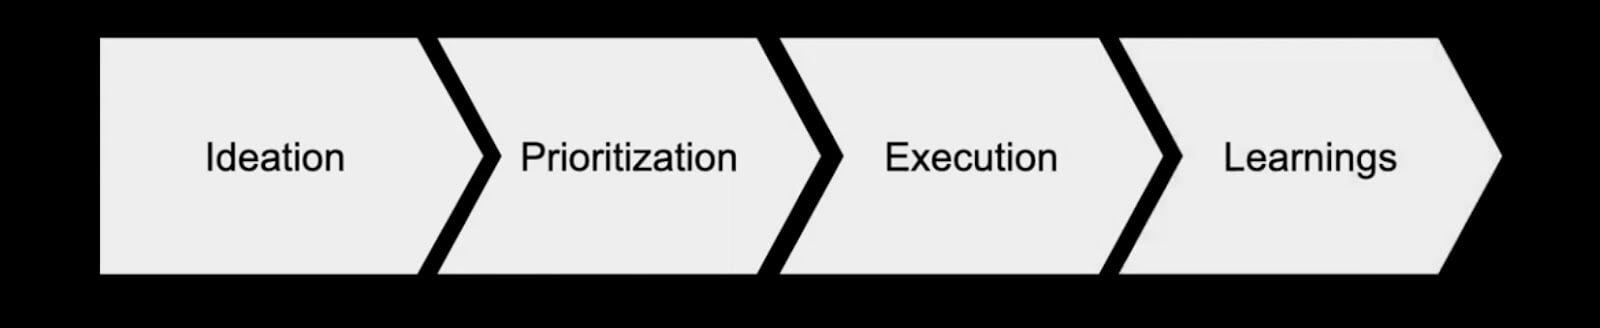 growth optimization process